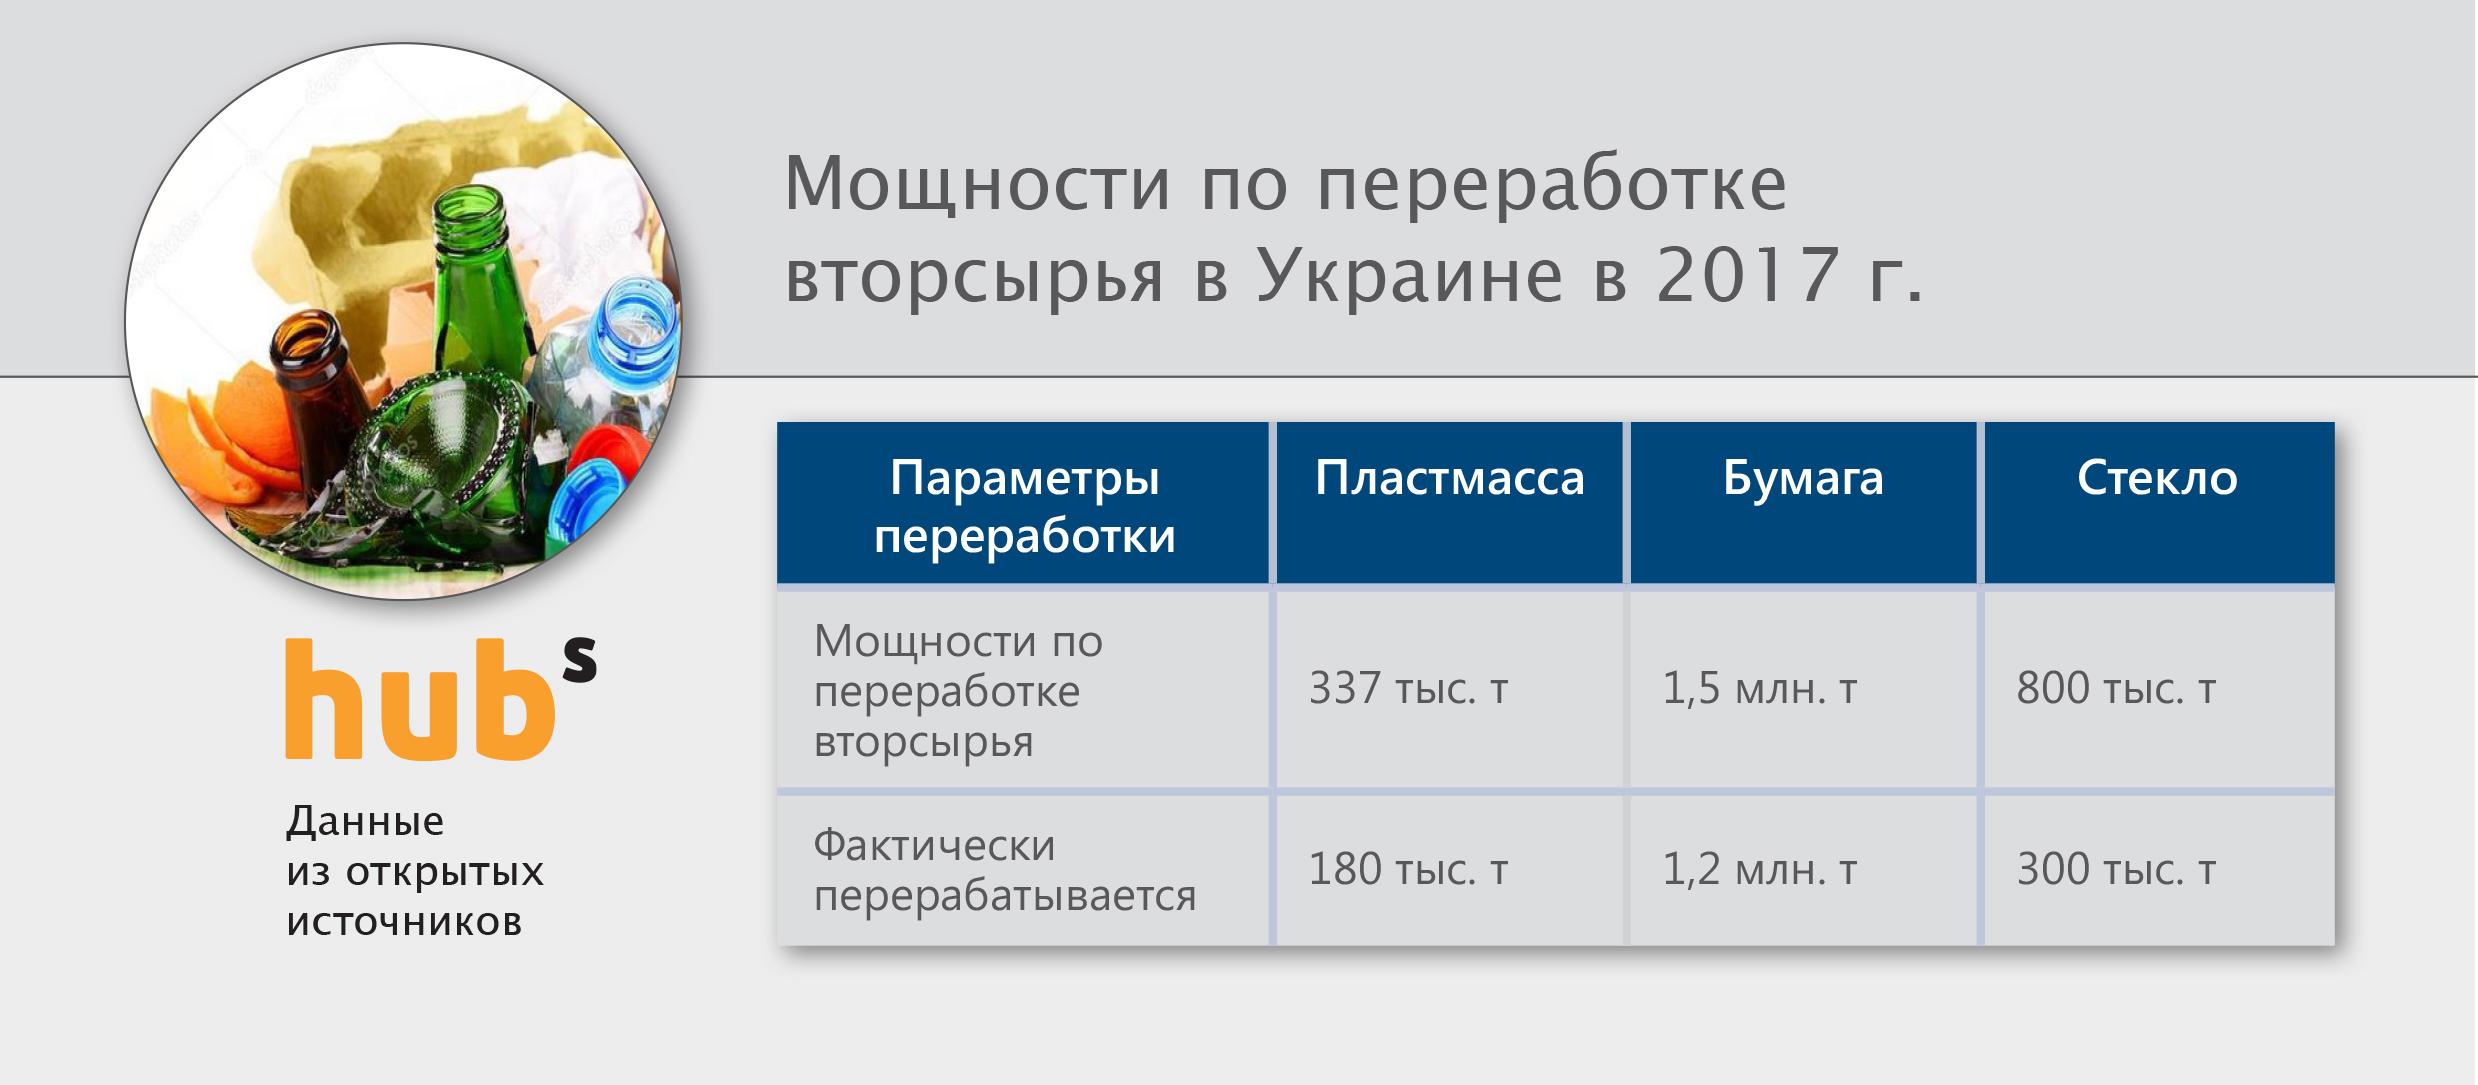 Переработка макулатуры на украине пункты приема макулатуры в коломне